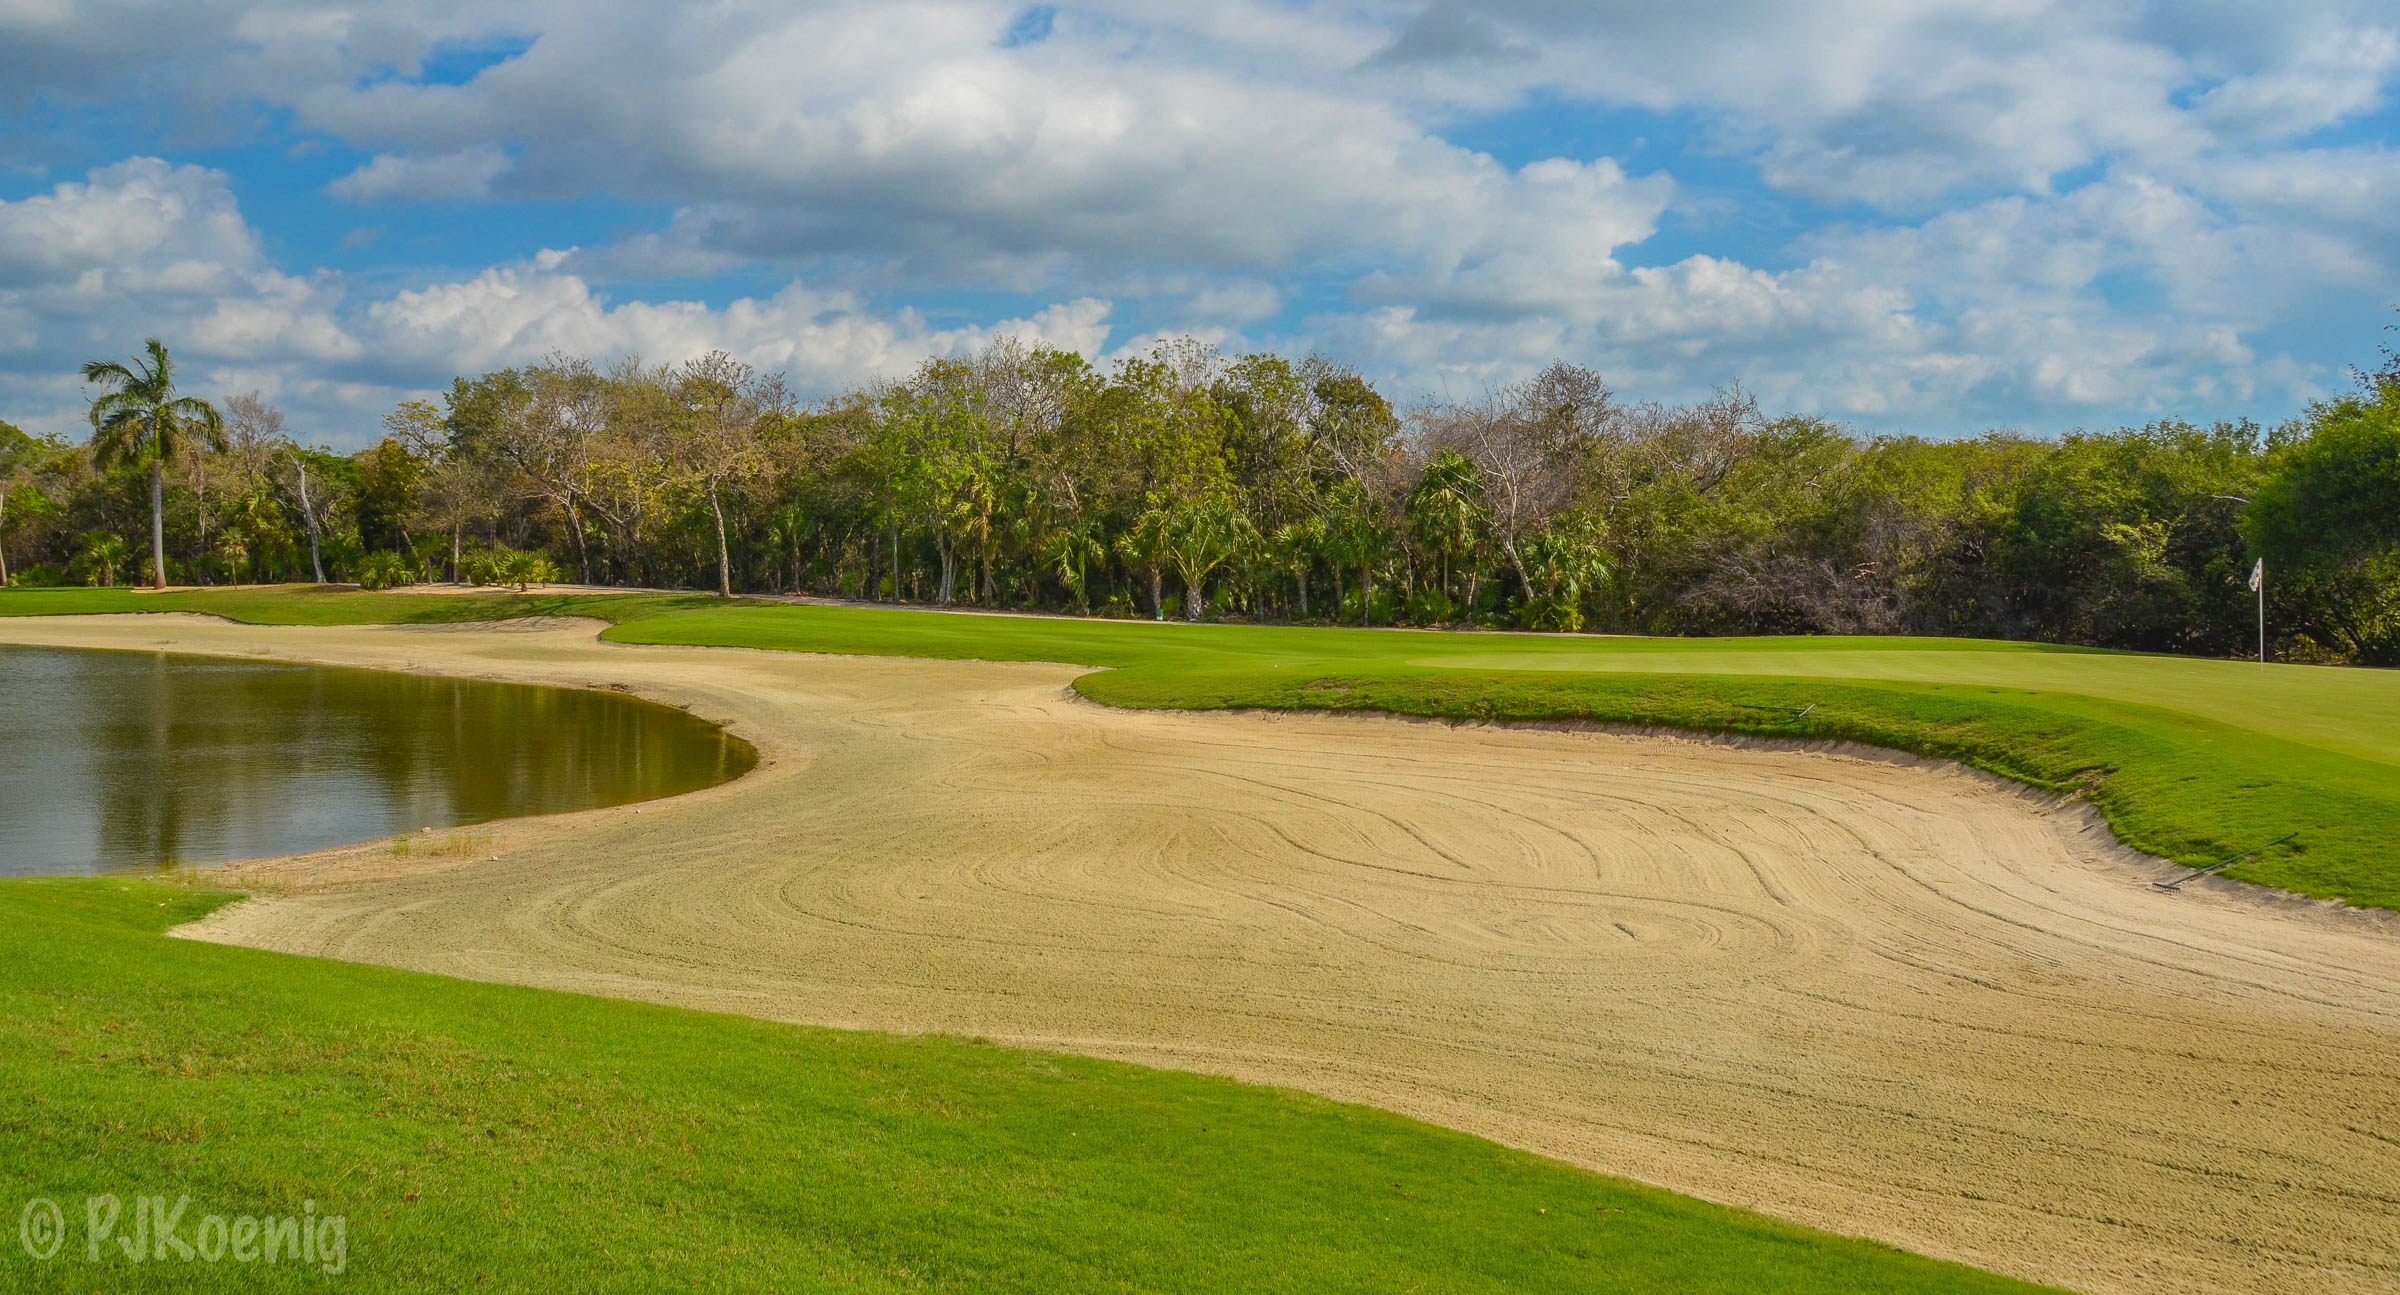 Moon Palace Golf Club - Cancun, Mexico